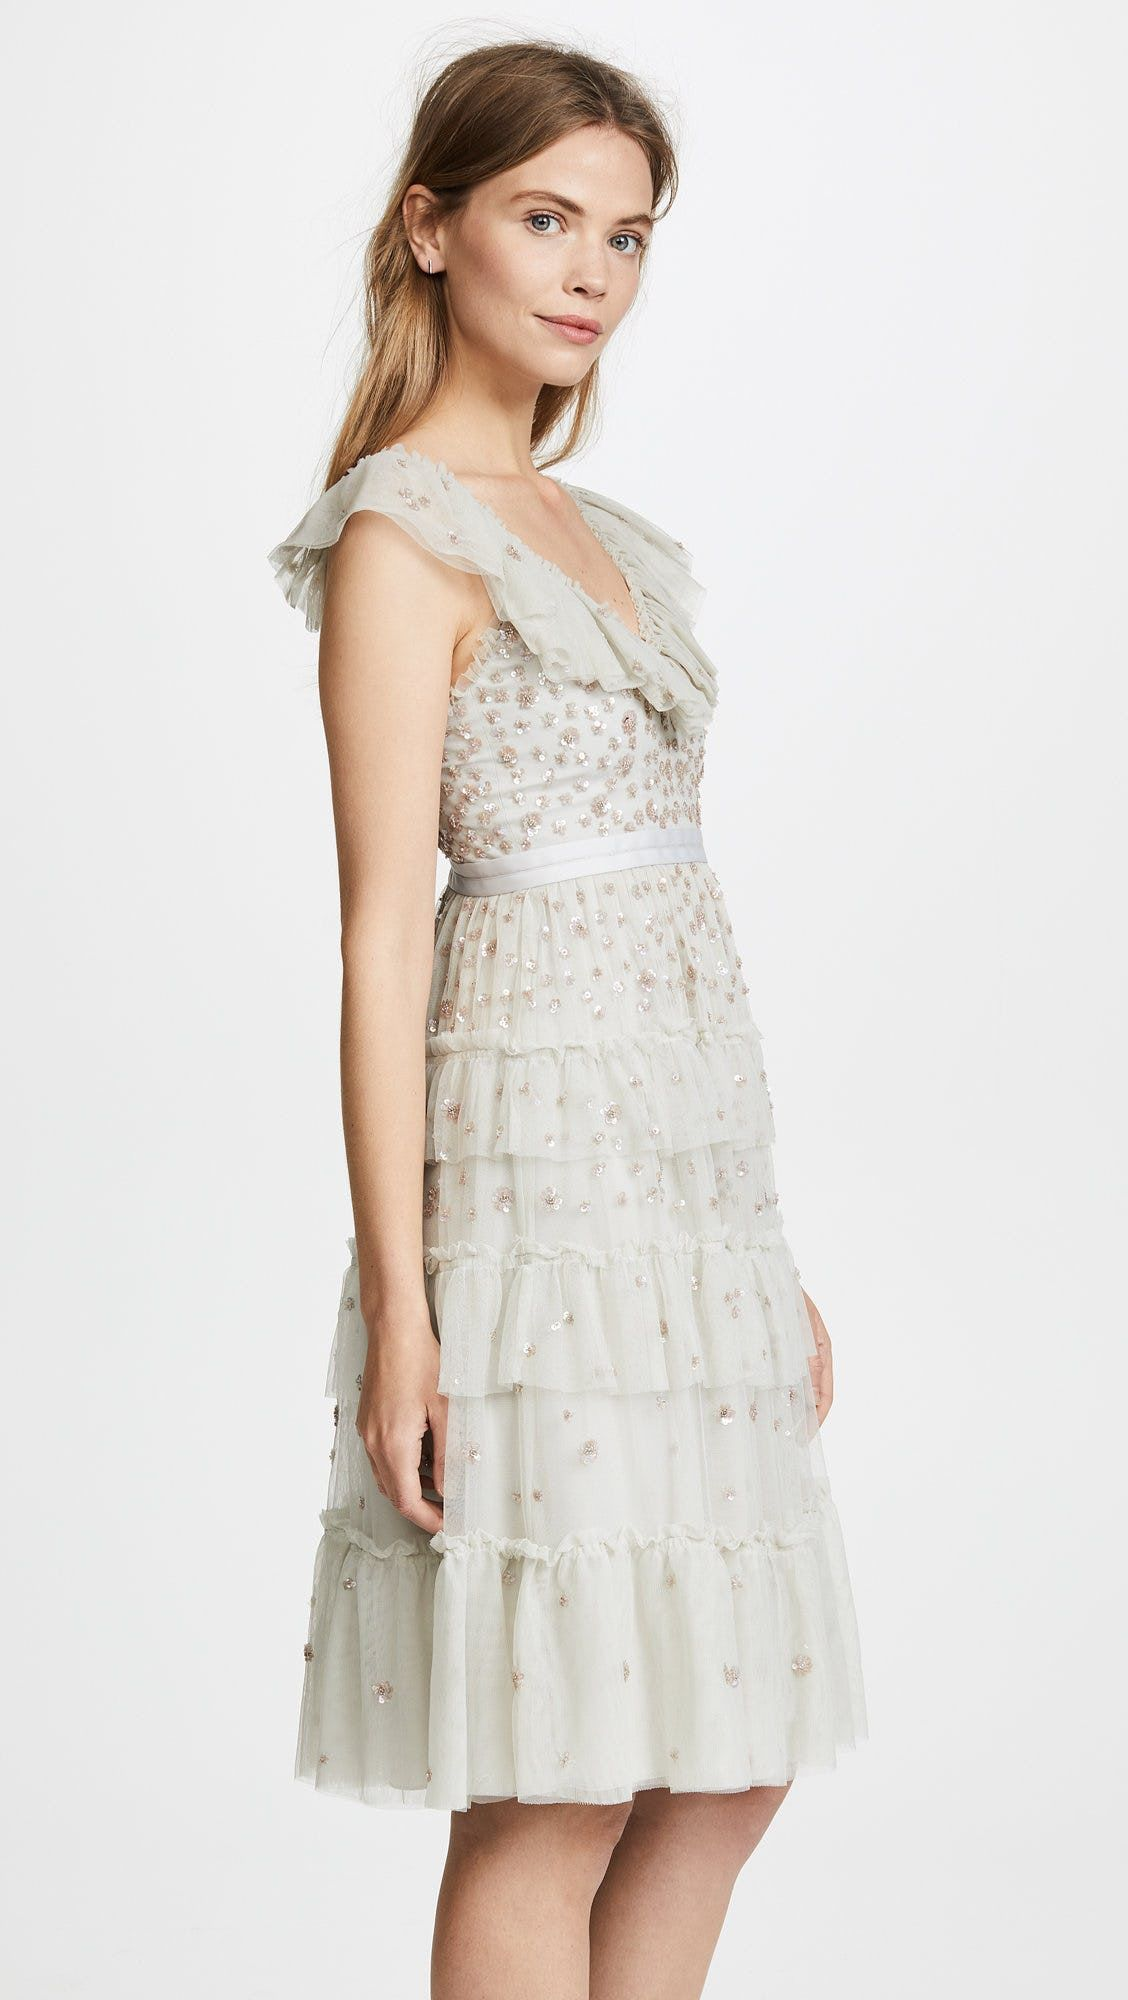 12 Affordable Spring Wedding Guest Dresses You Can Score On Amazon Spring Wedding Guest Dress Wedding Guest Outfit Spring Spring Dresses Casual [ 1360 x 1000 Pixel ]